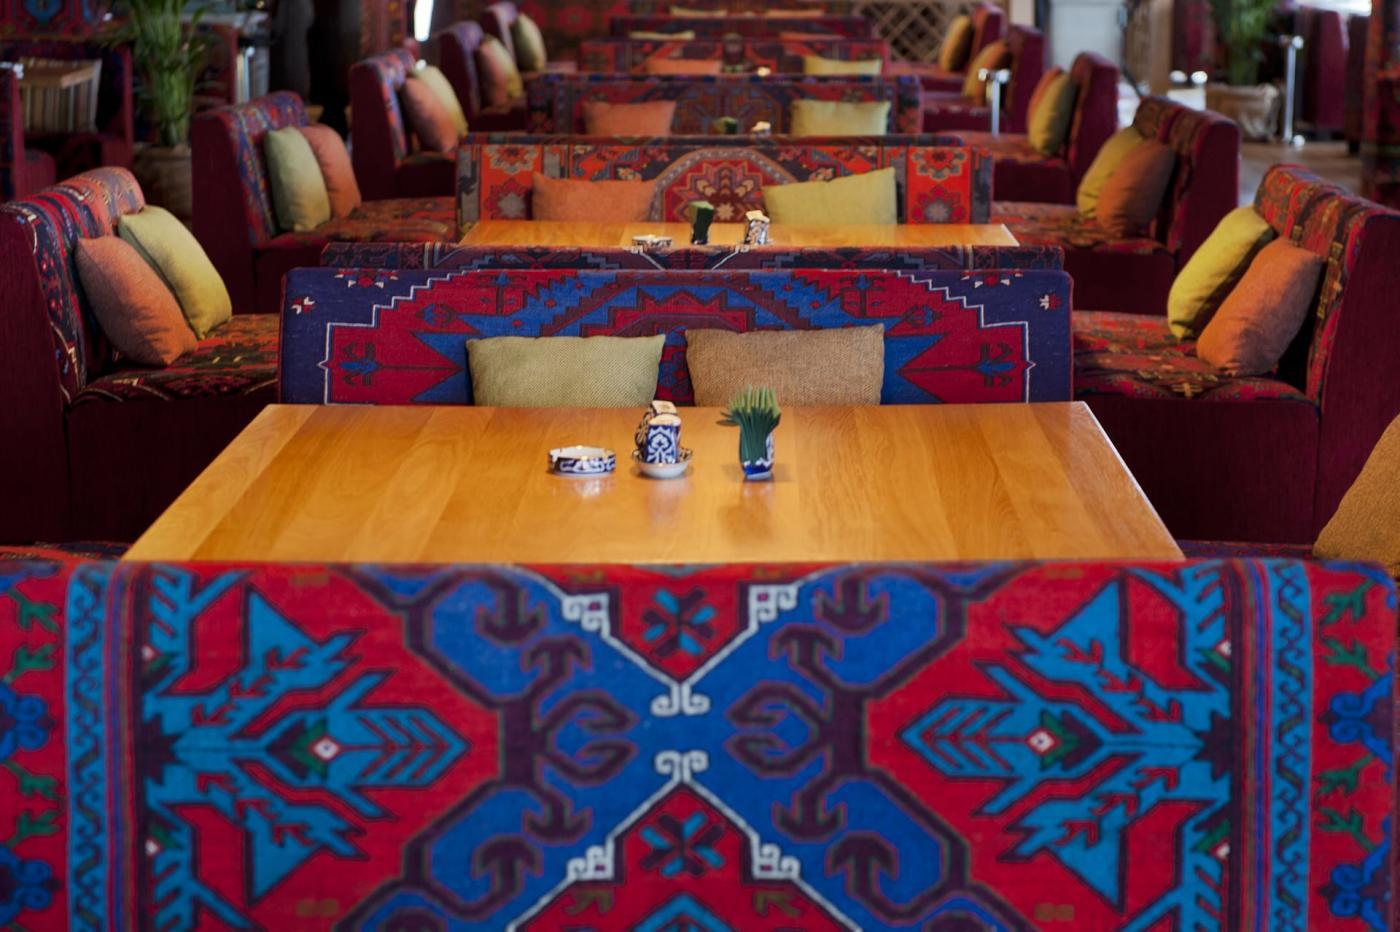 Ресторан Тапчан Площадь Ильича (Римская / Сергия Радонежского - Топчан) фото 6